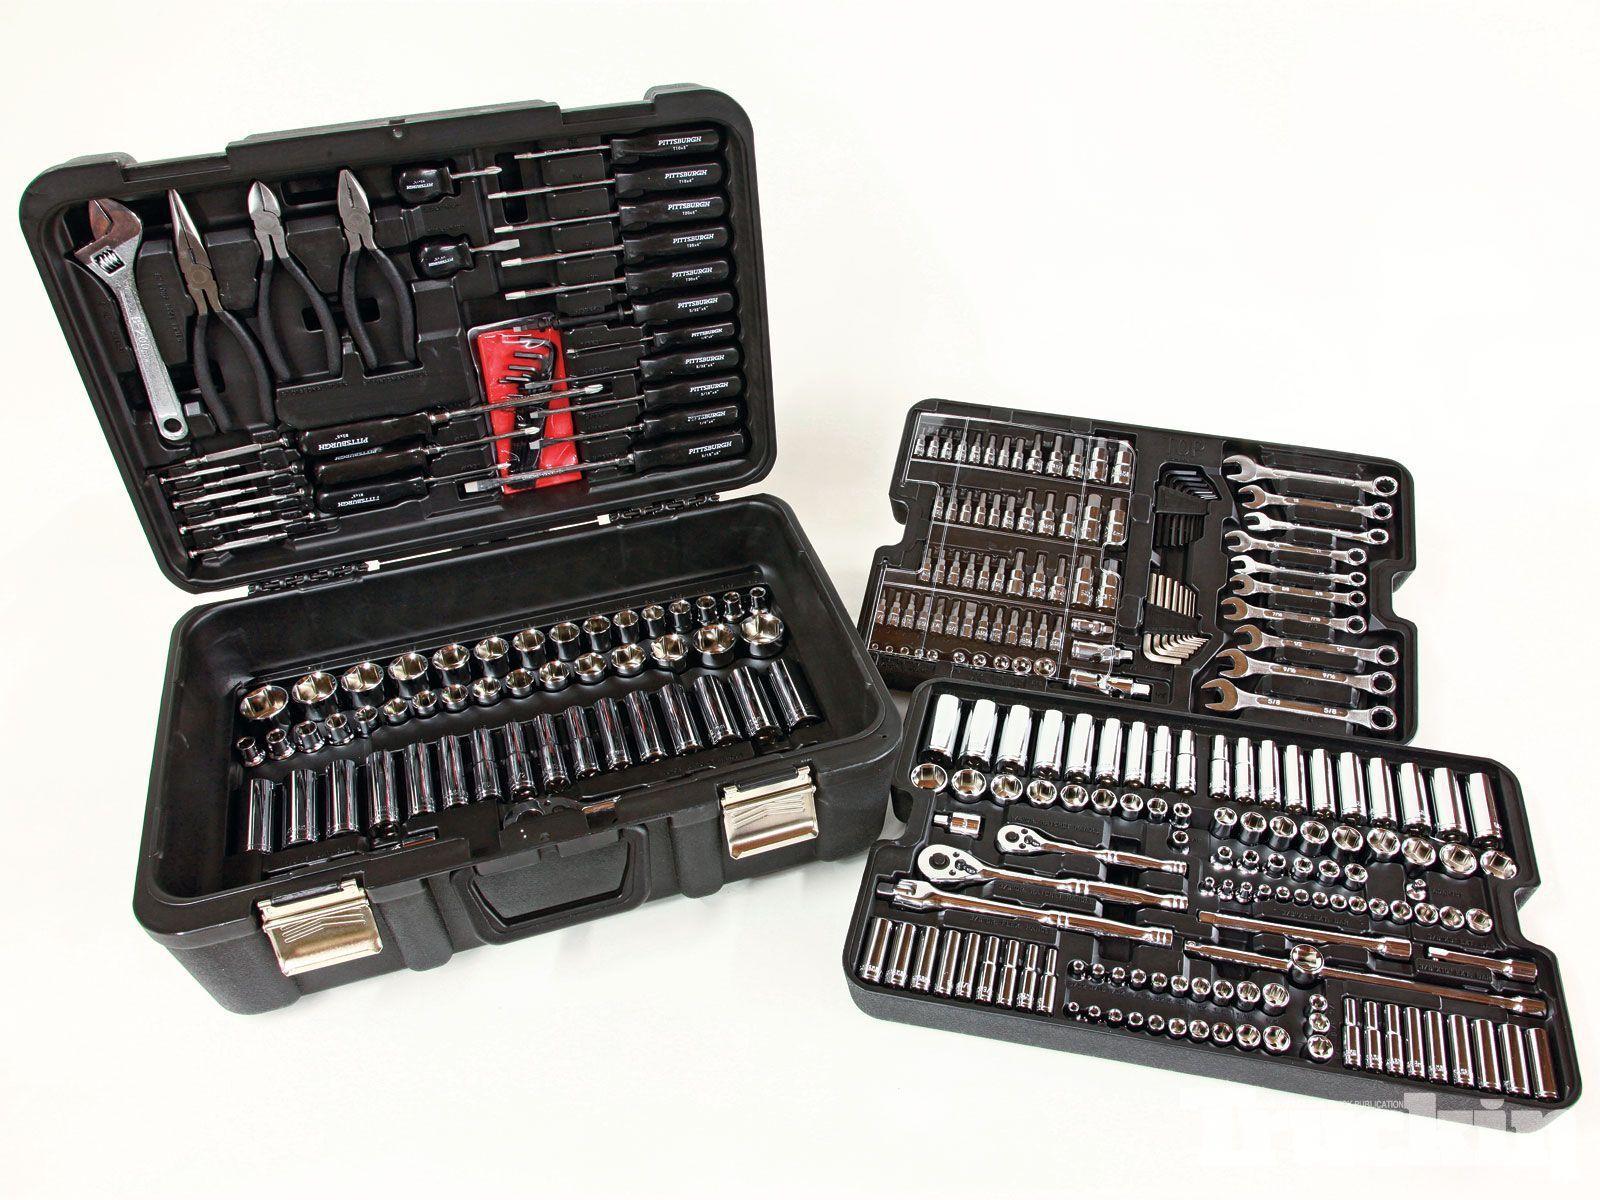 Brand New 301 Piece Mechanic's Tool Set Kit Shop Garage Repair